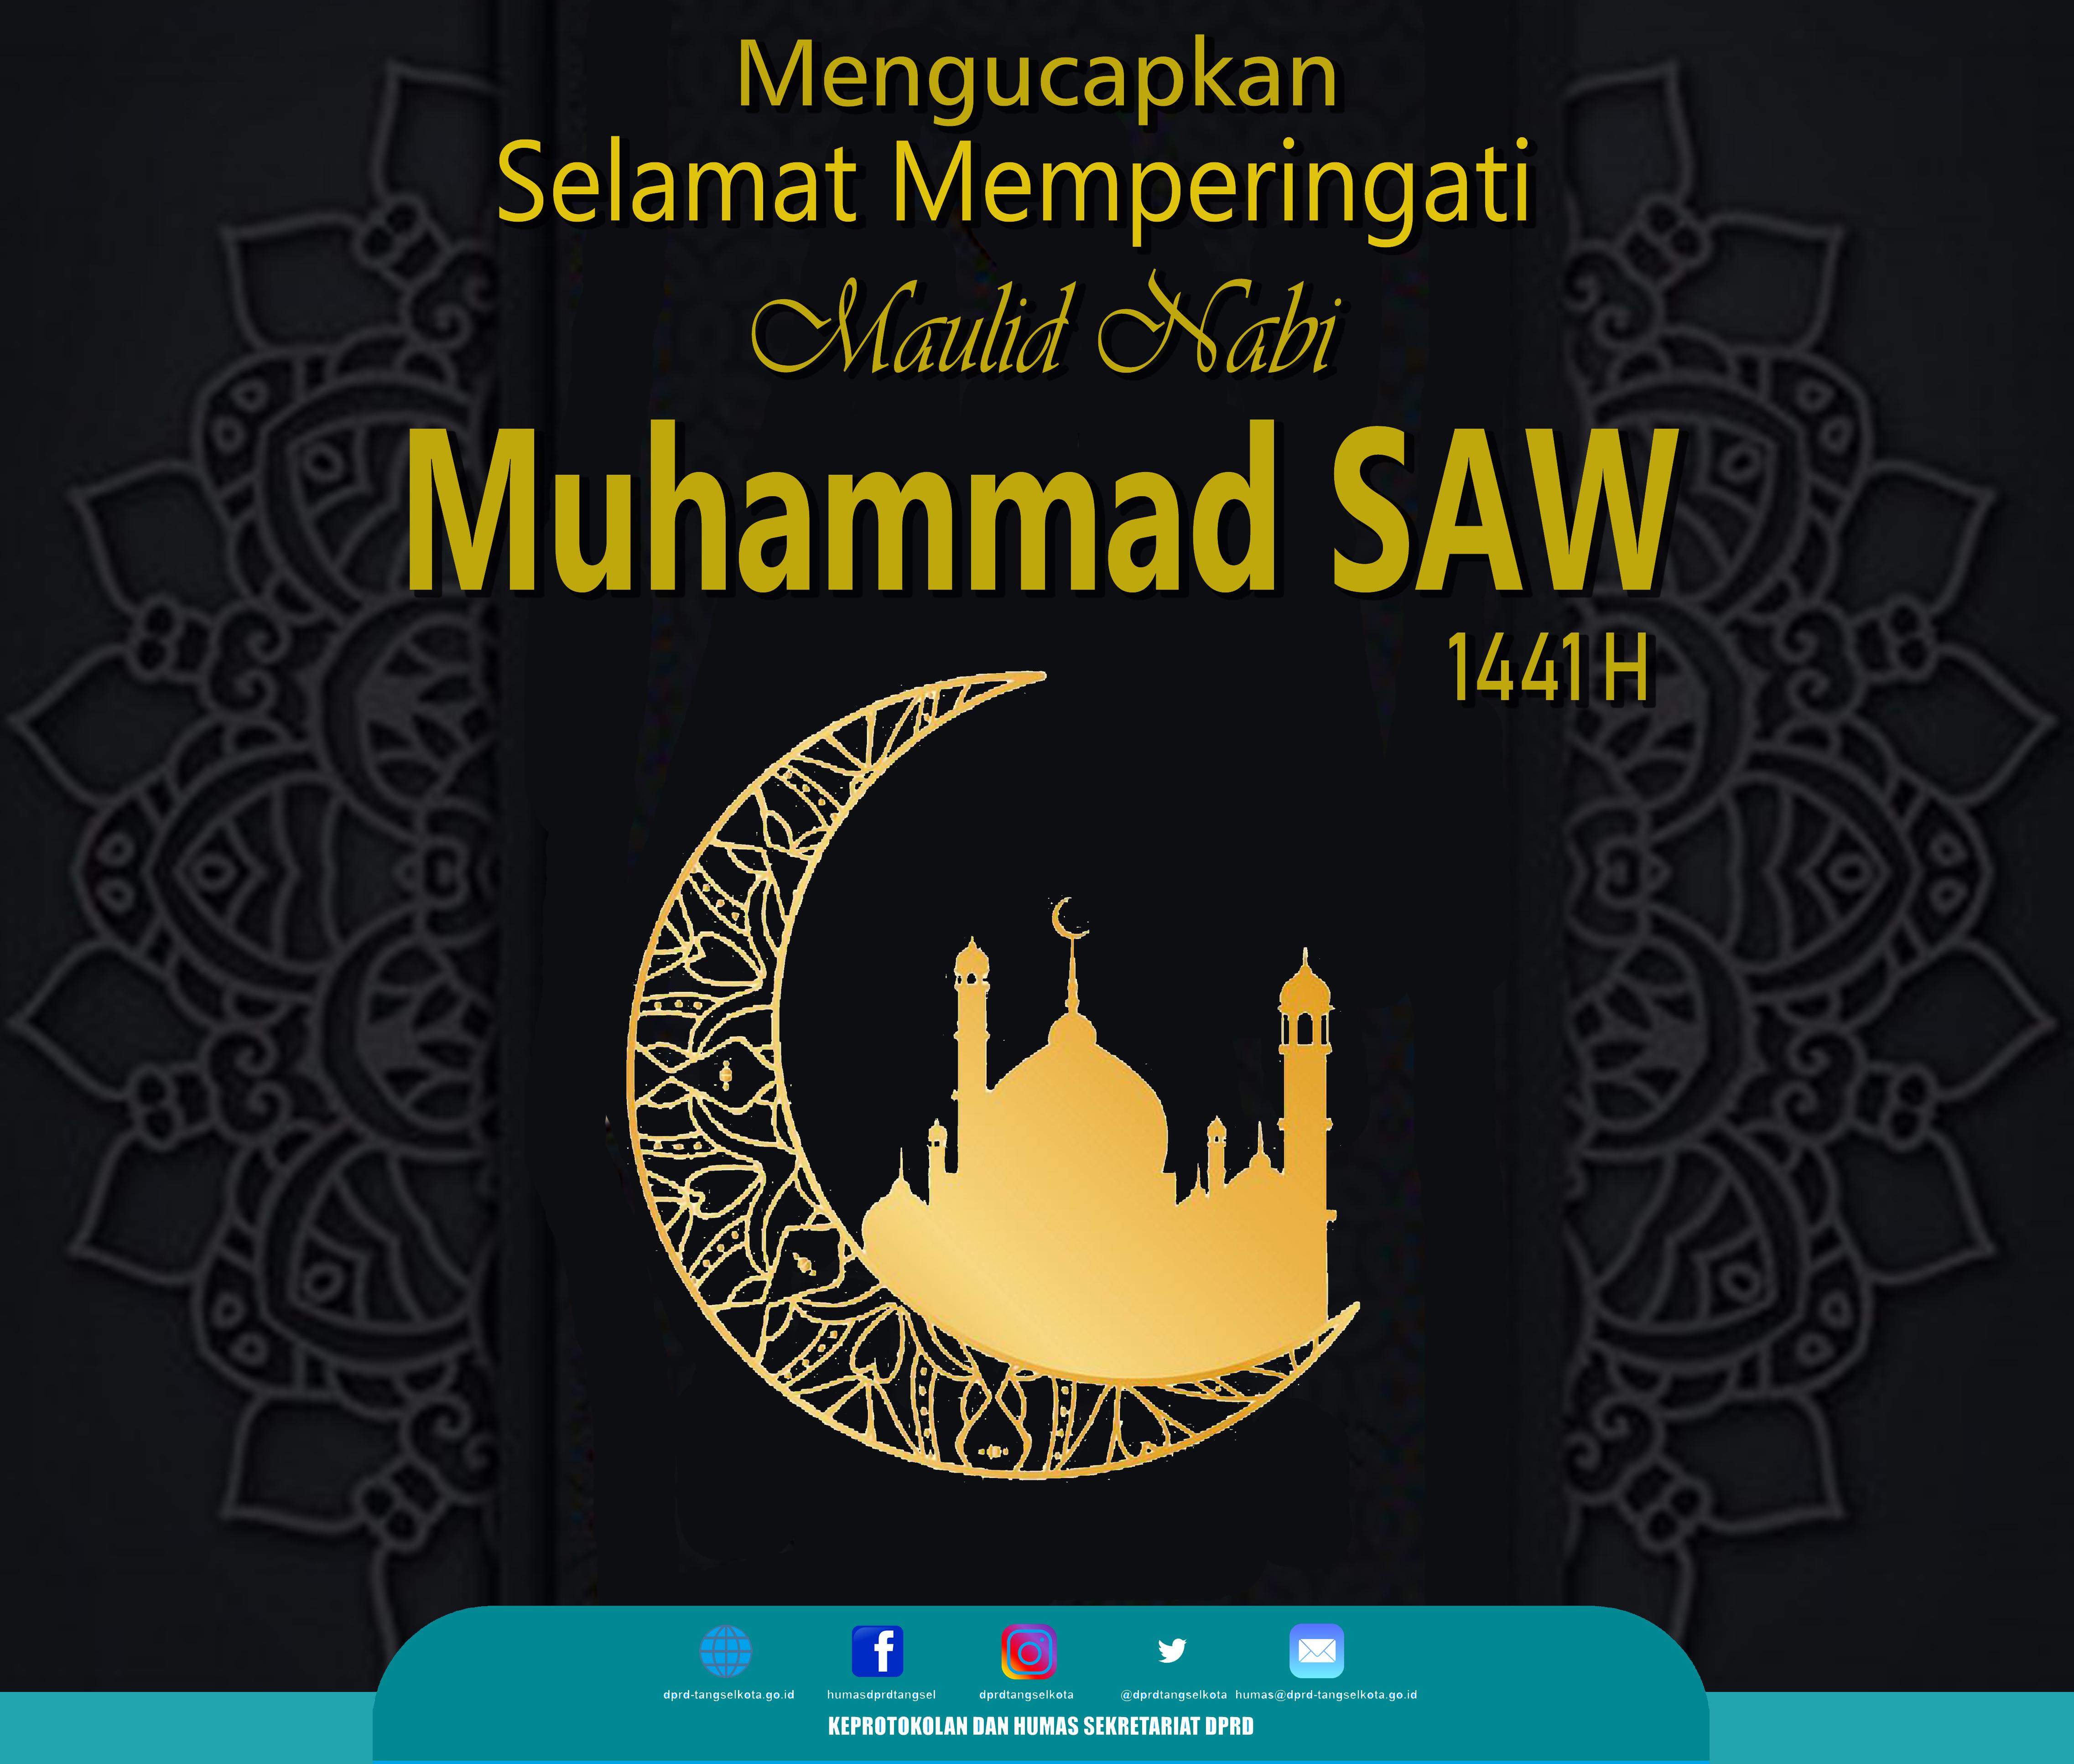 Selamat Memperingati Maulid Nabi Muhammad SAW 1441H